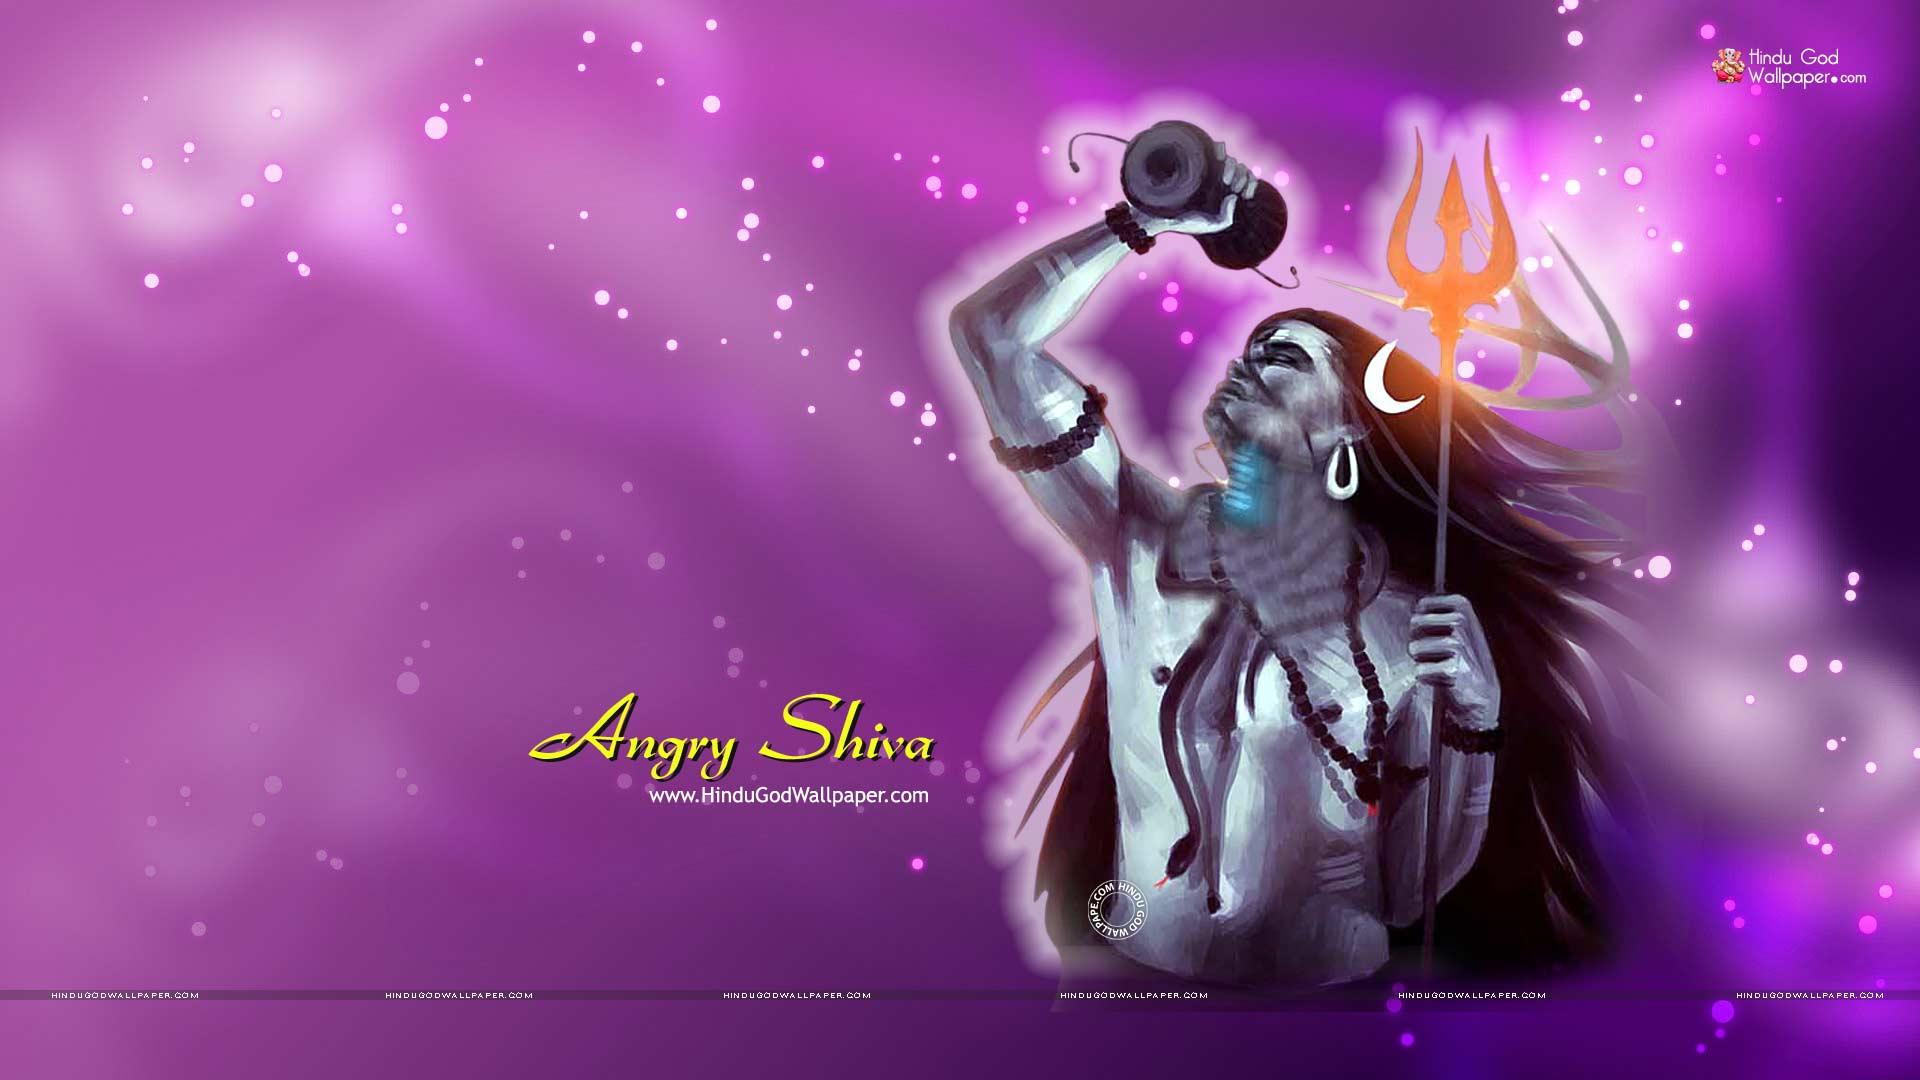 angry shiva wallpapers top free angry shiva backgrounds wallpaperaccess angry shiva wallpapers top free angry